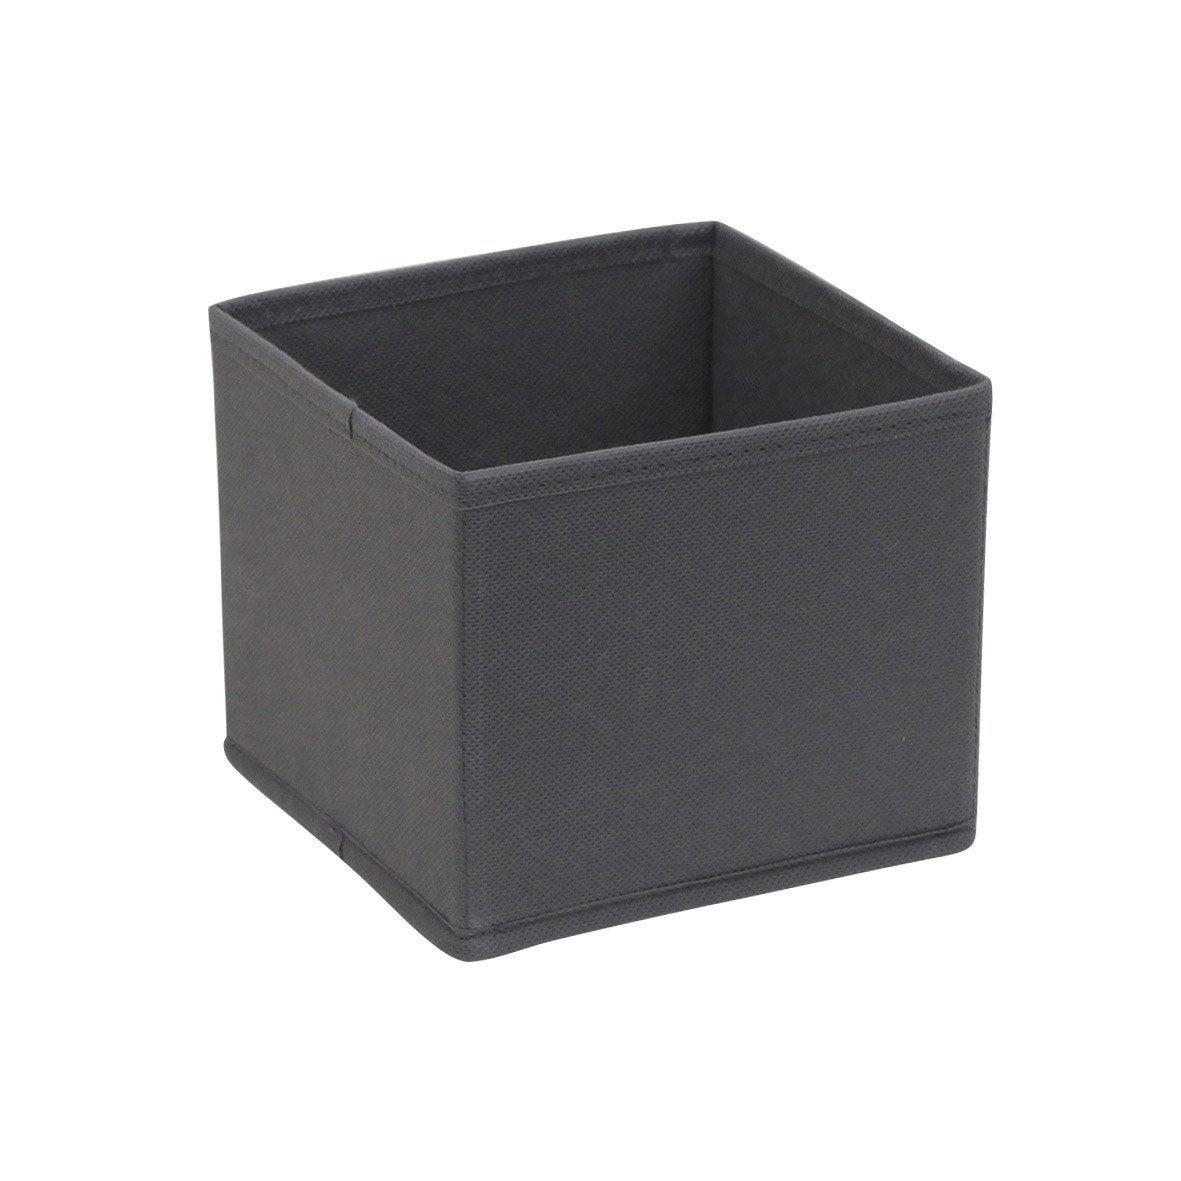 panier de rangement spaceo gris x x cm leroy merlin. Black Bedroom Furniture Sets. Home Design Ideas